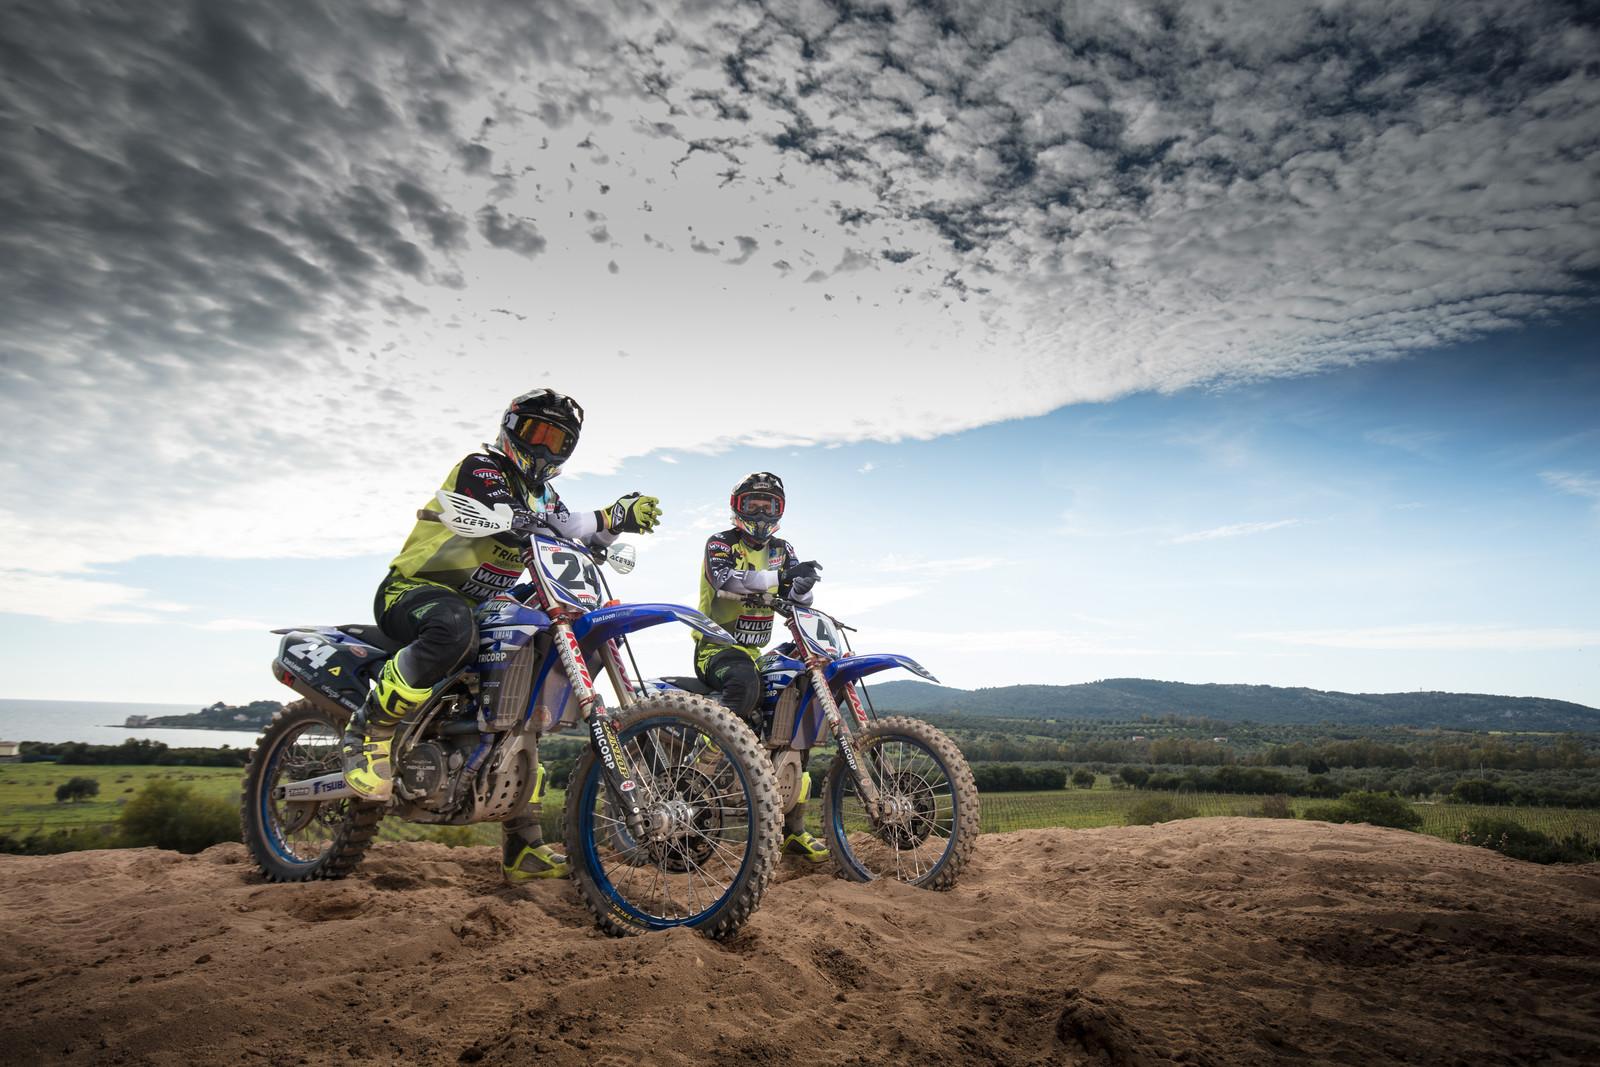 Shaun Simpson and Arnaud Tonus - First Look: 2017 Monster Energy & Wilvo Yamaha MXGP Teams - Motocross Pictures - Vital MX